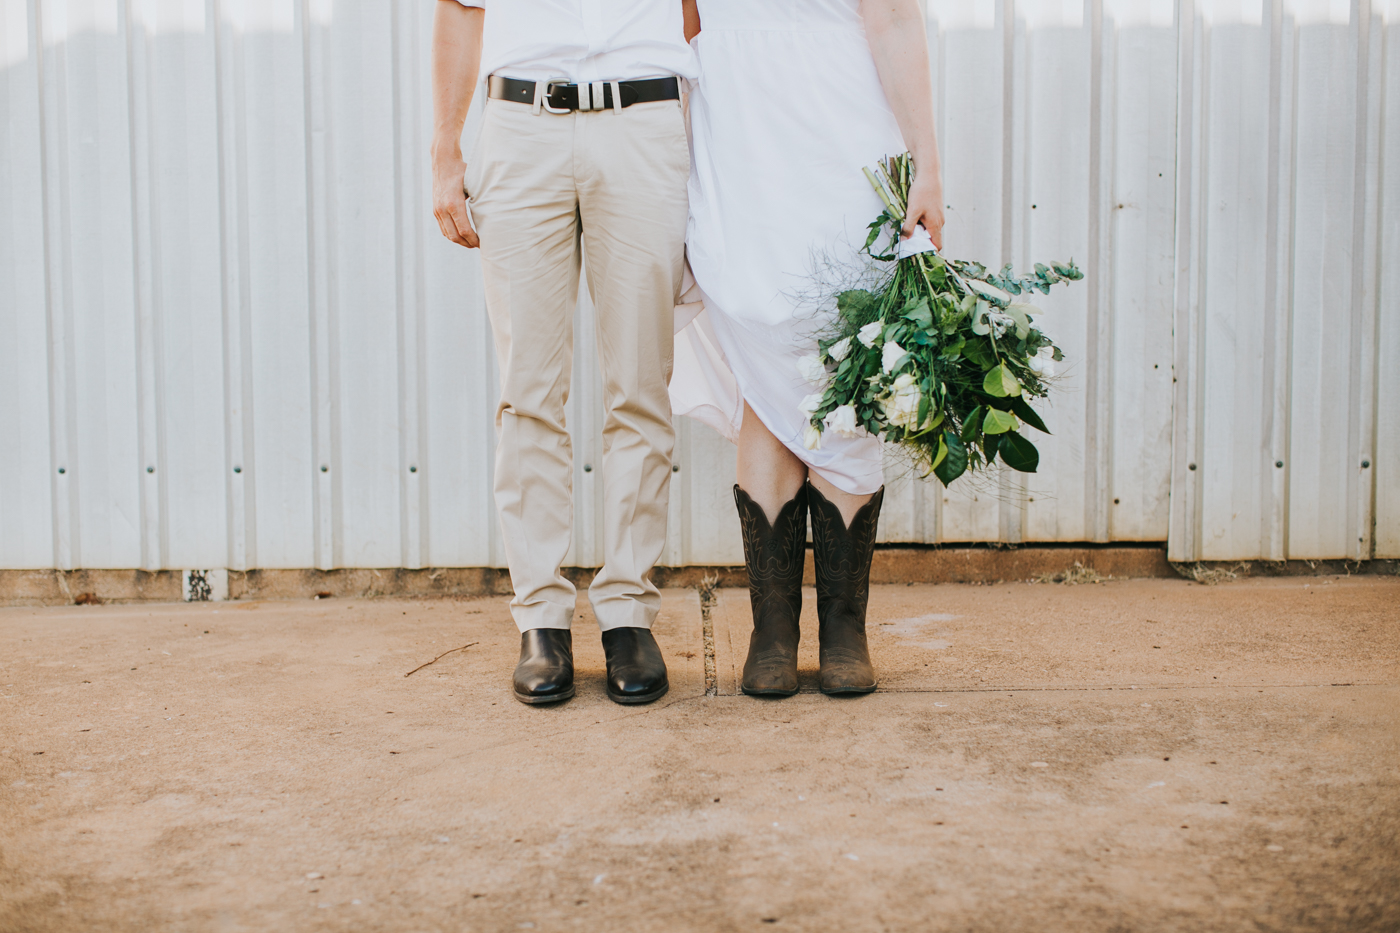 Nicolle & Jacob - Dubbo Wedding - Country Australia - Samantha Heather Photography-190.jpg